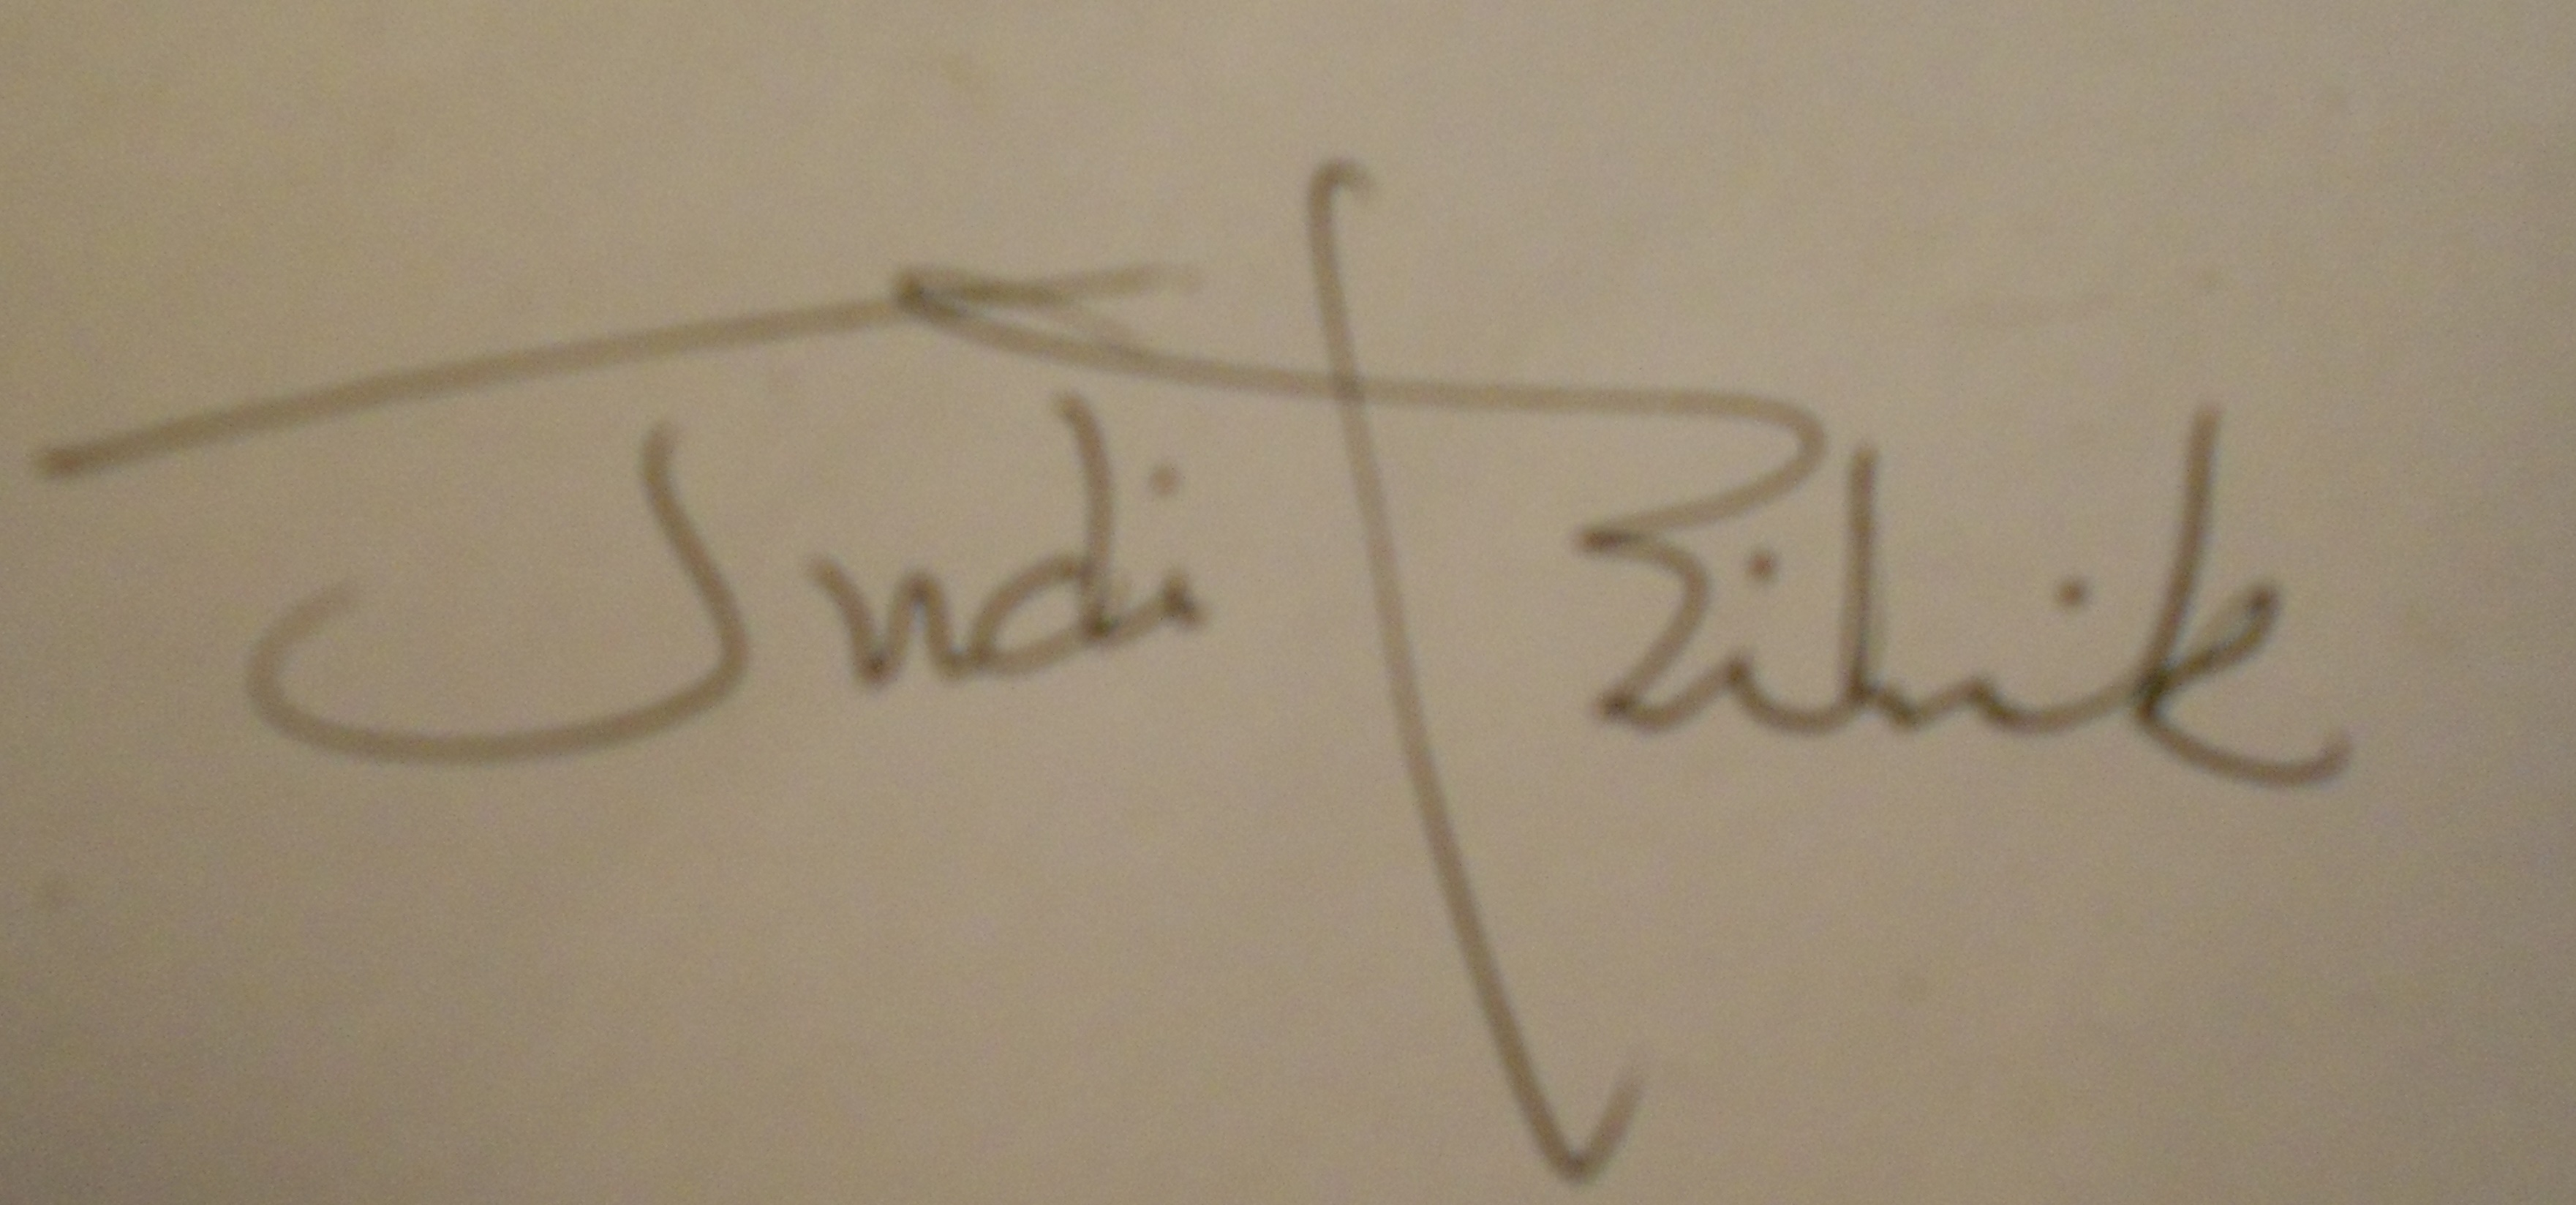 Judith bilick Signature